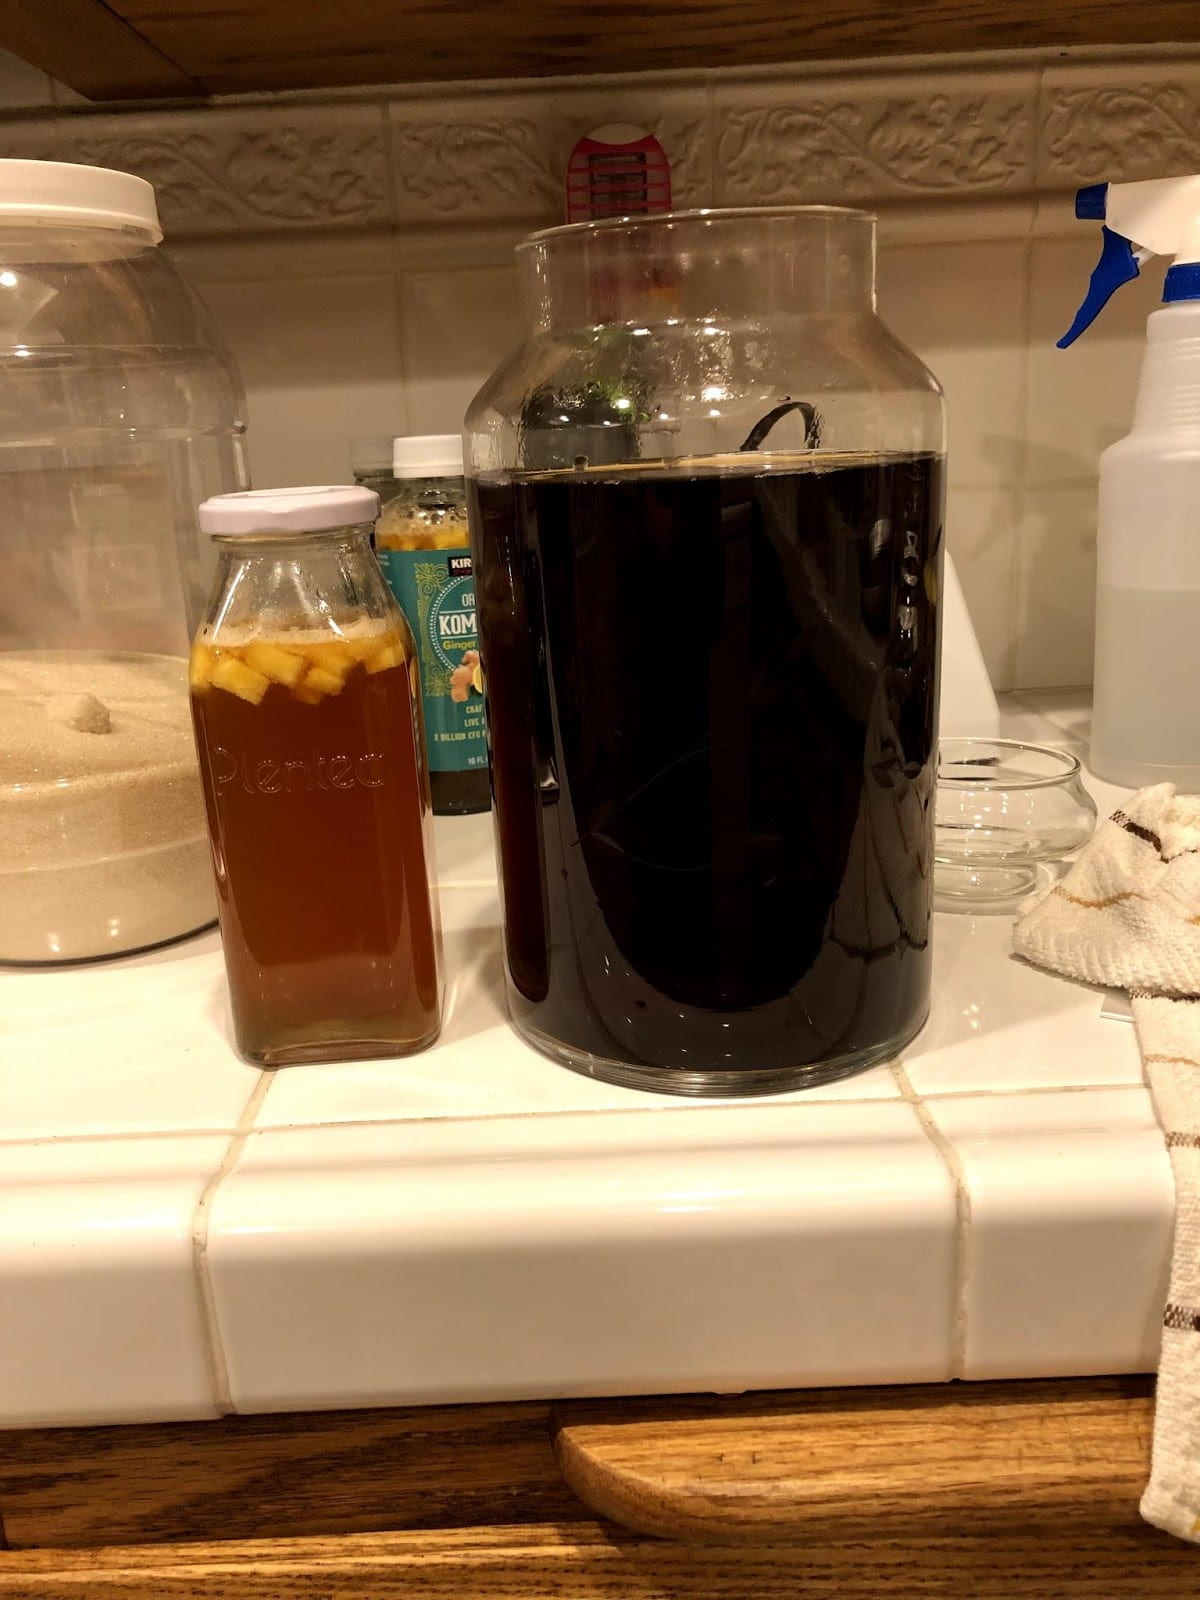 A glass and a pitcher of kombucha.